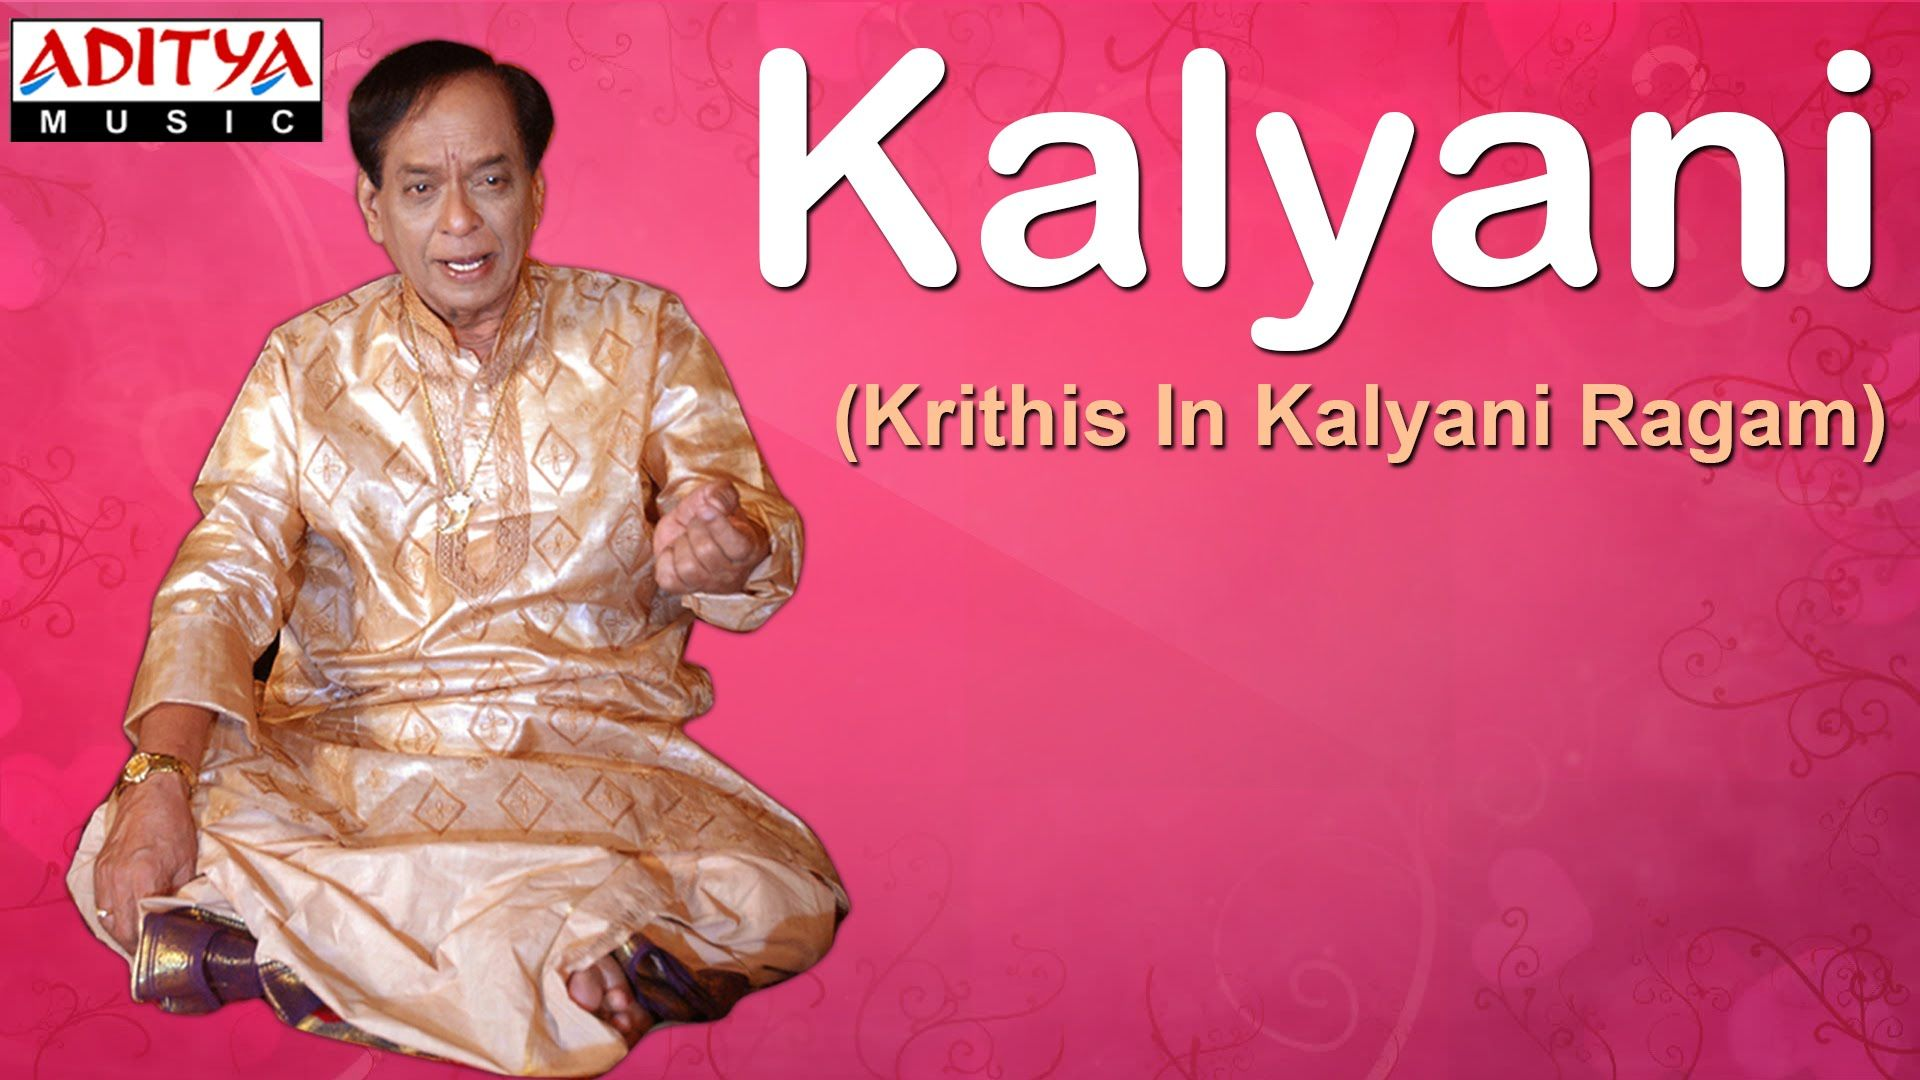 Kalyani Krithis In Kalyani Ragam Dr M Balamuralikrishna Carnatic Classical Peace And Love Head And Heart Music